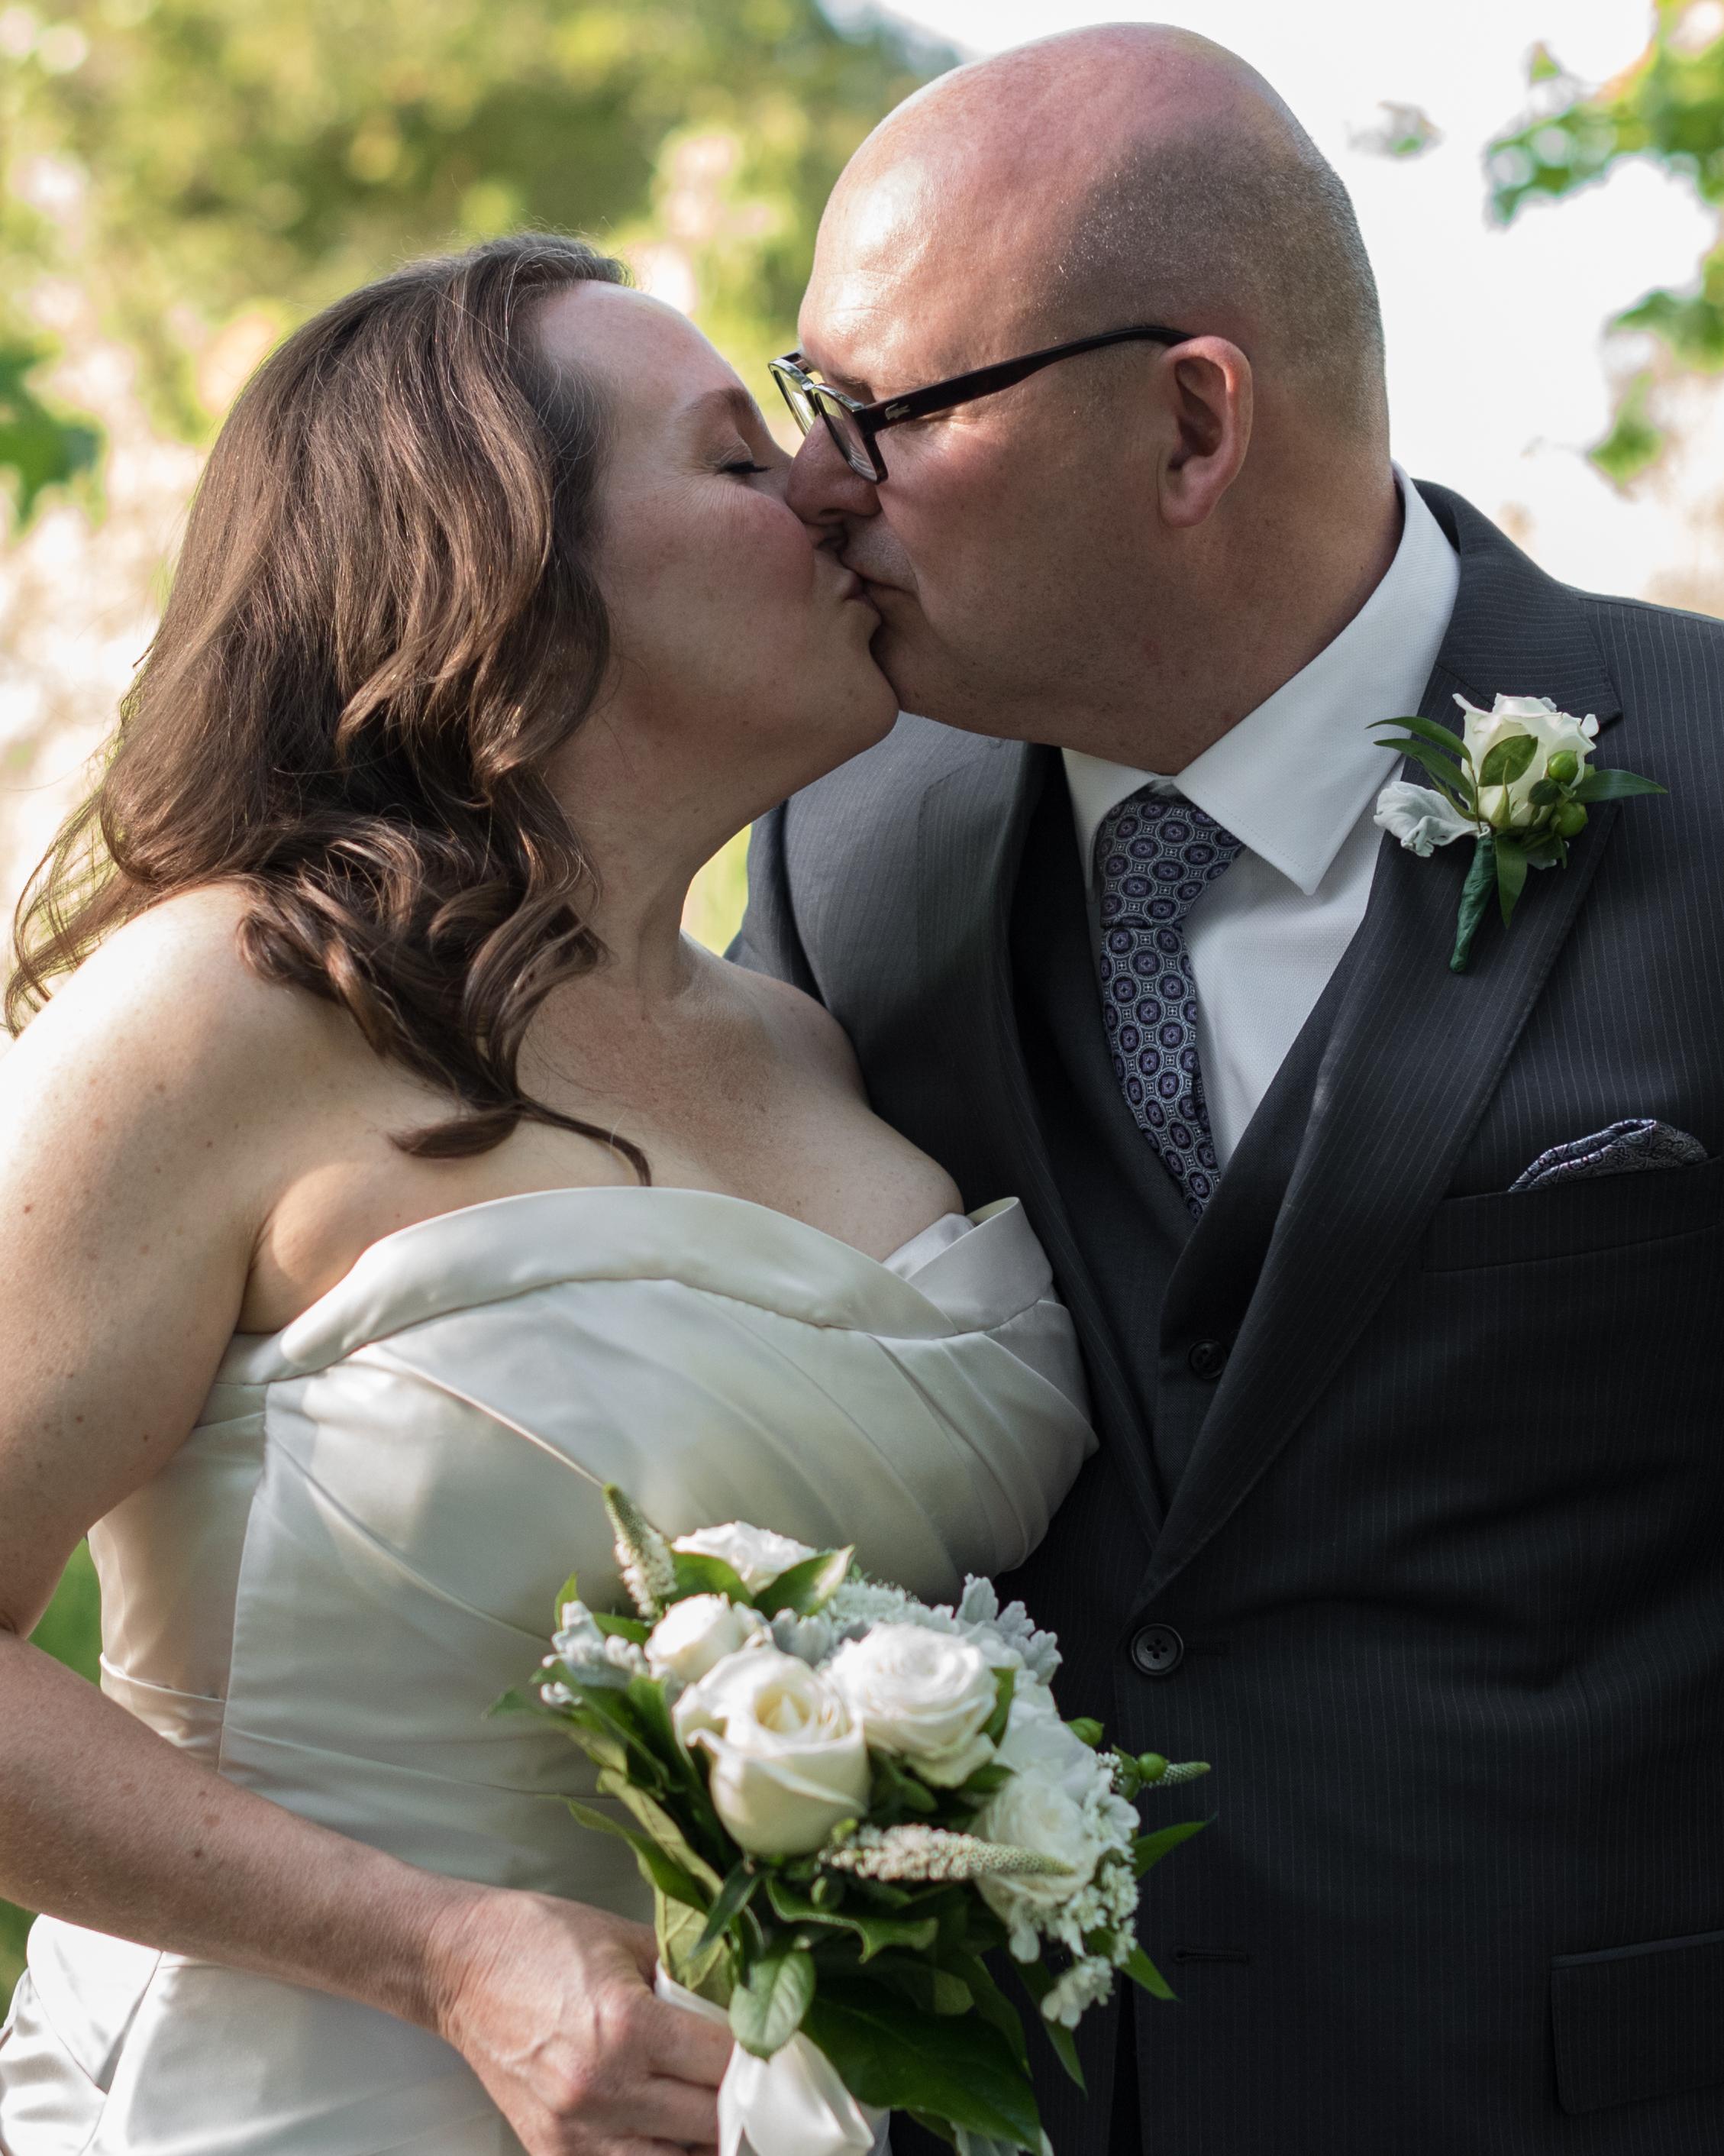 Seana and Terry_May_2019_GarrickWong-1227-2.jpg